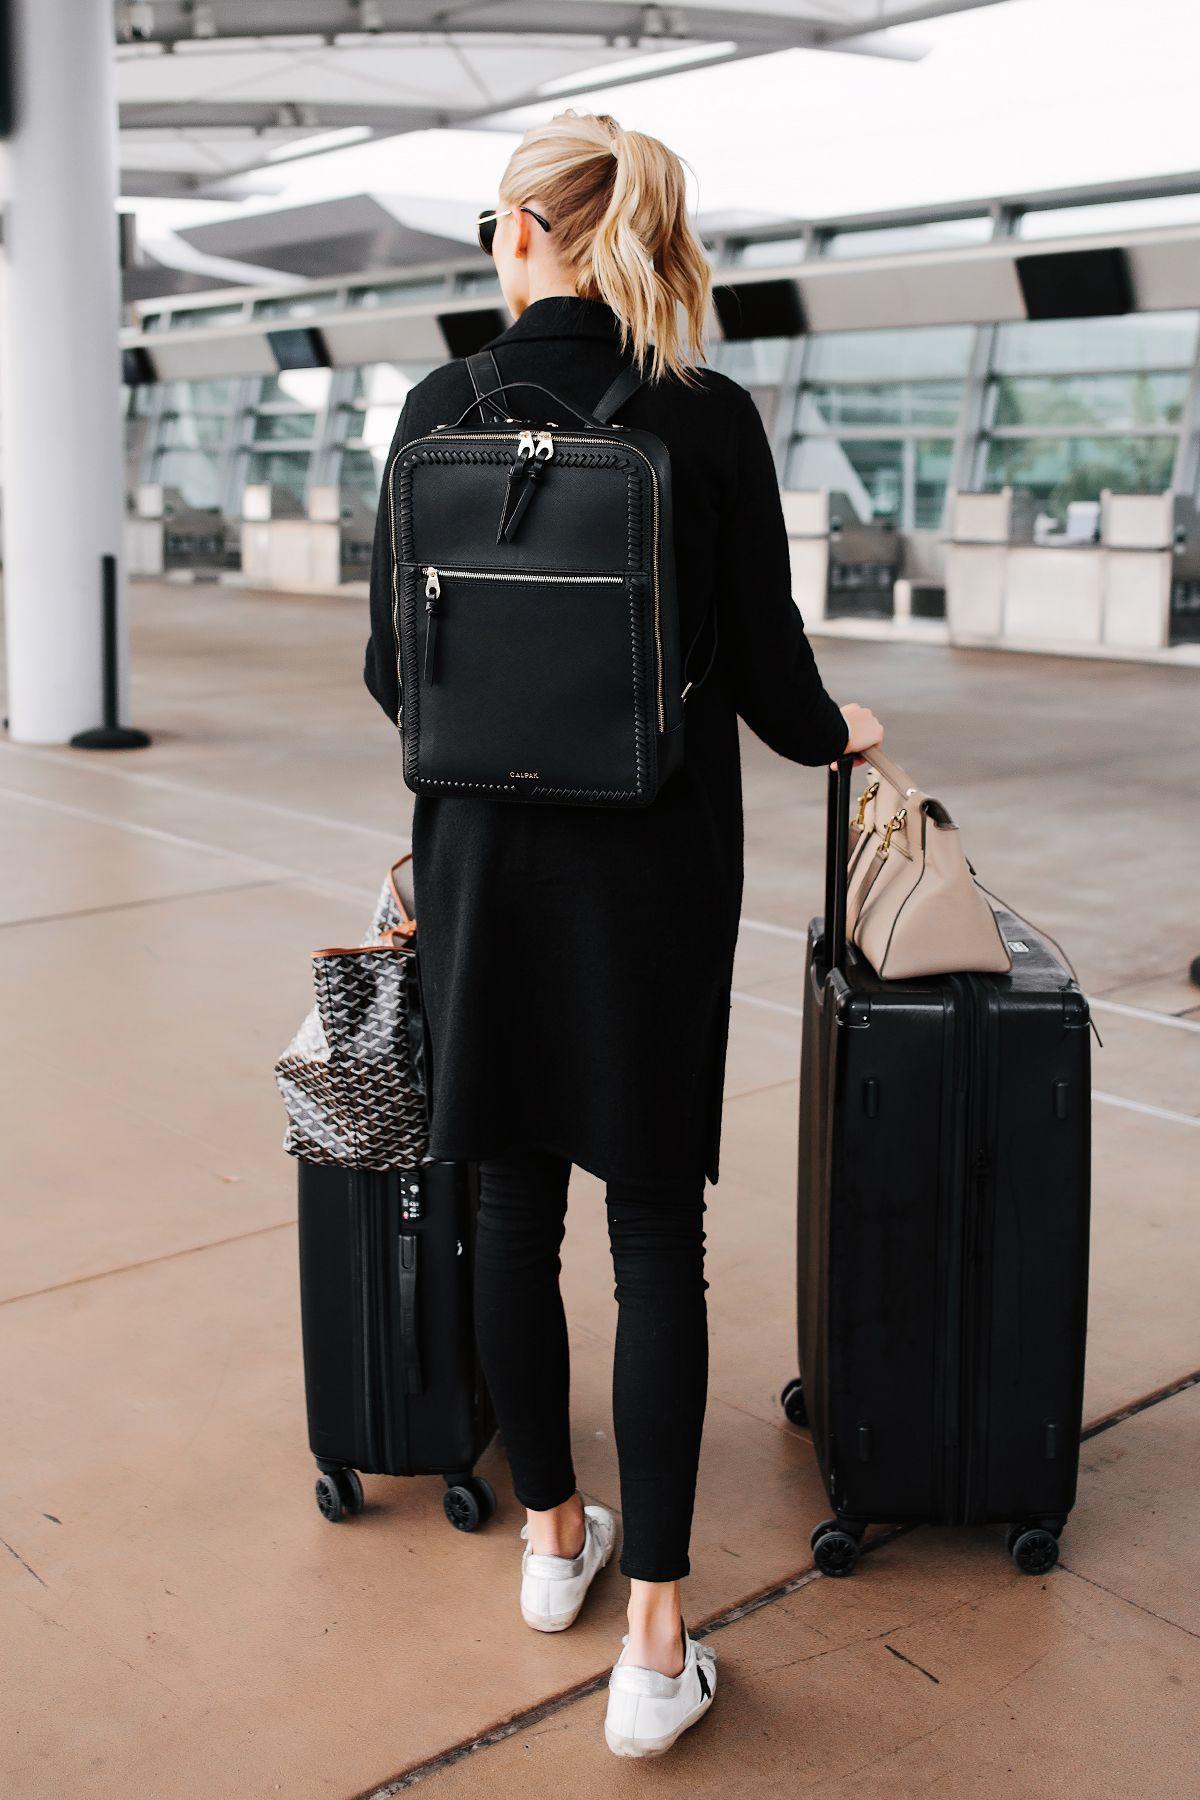 7a5a3f4bf Fashion Jackson Wearing Calpak Kaya Black Backpack Calpak Black Luggage  Airport Style